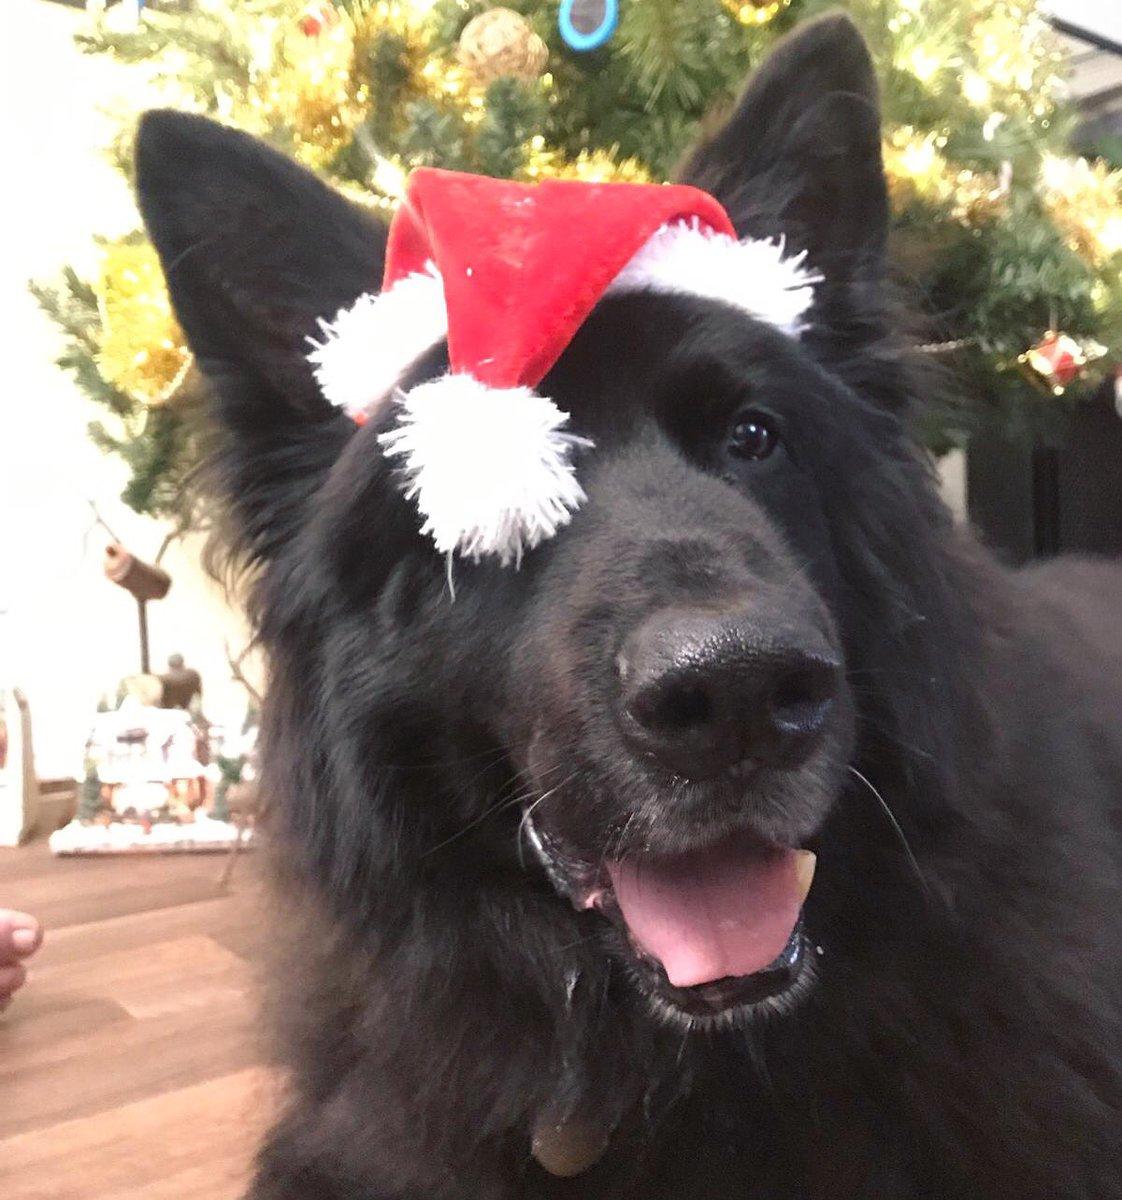 We're gonna need a bigger hat 🎅🏻 #GermanShepherd #dogsoftwitter